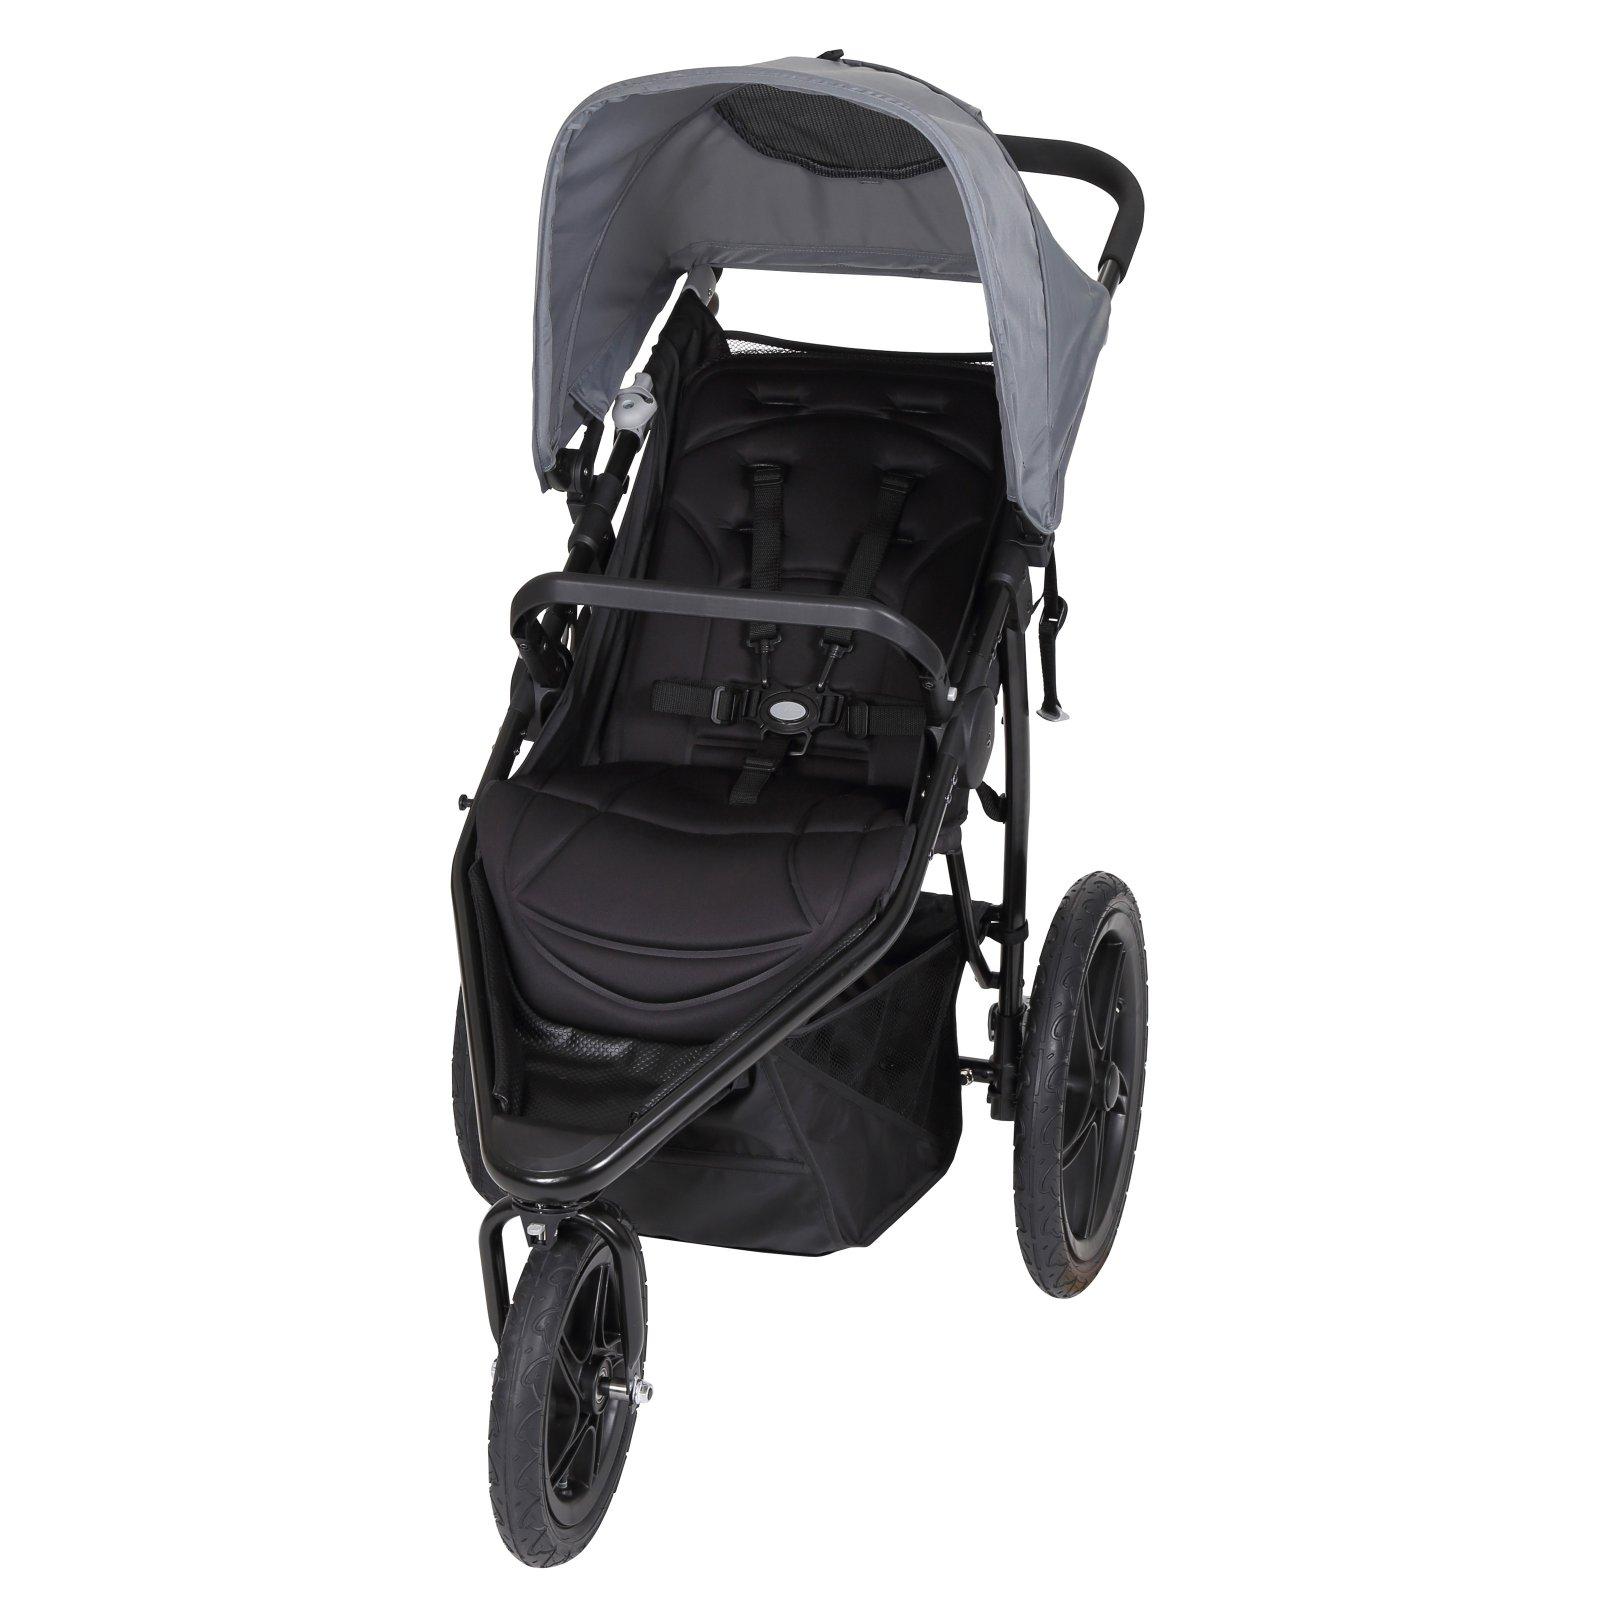 Baby Trend Stealth Jogging Stroller, Alloy